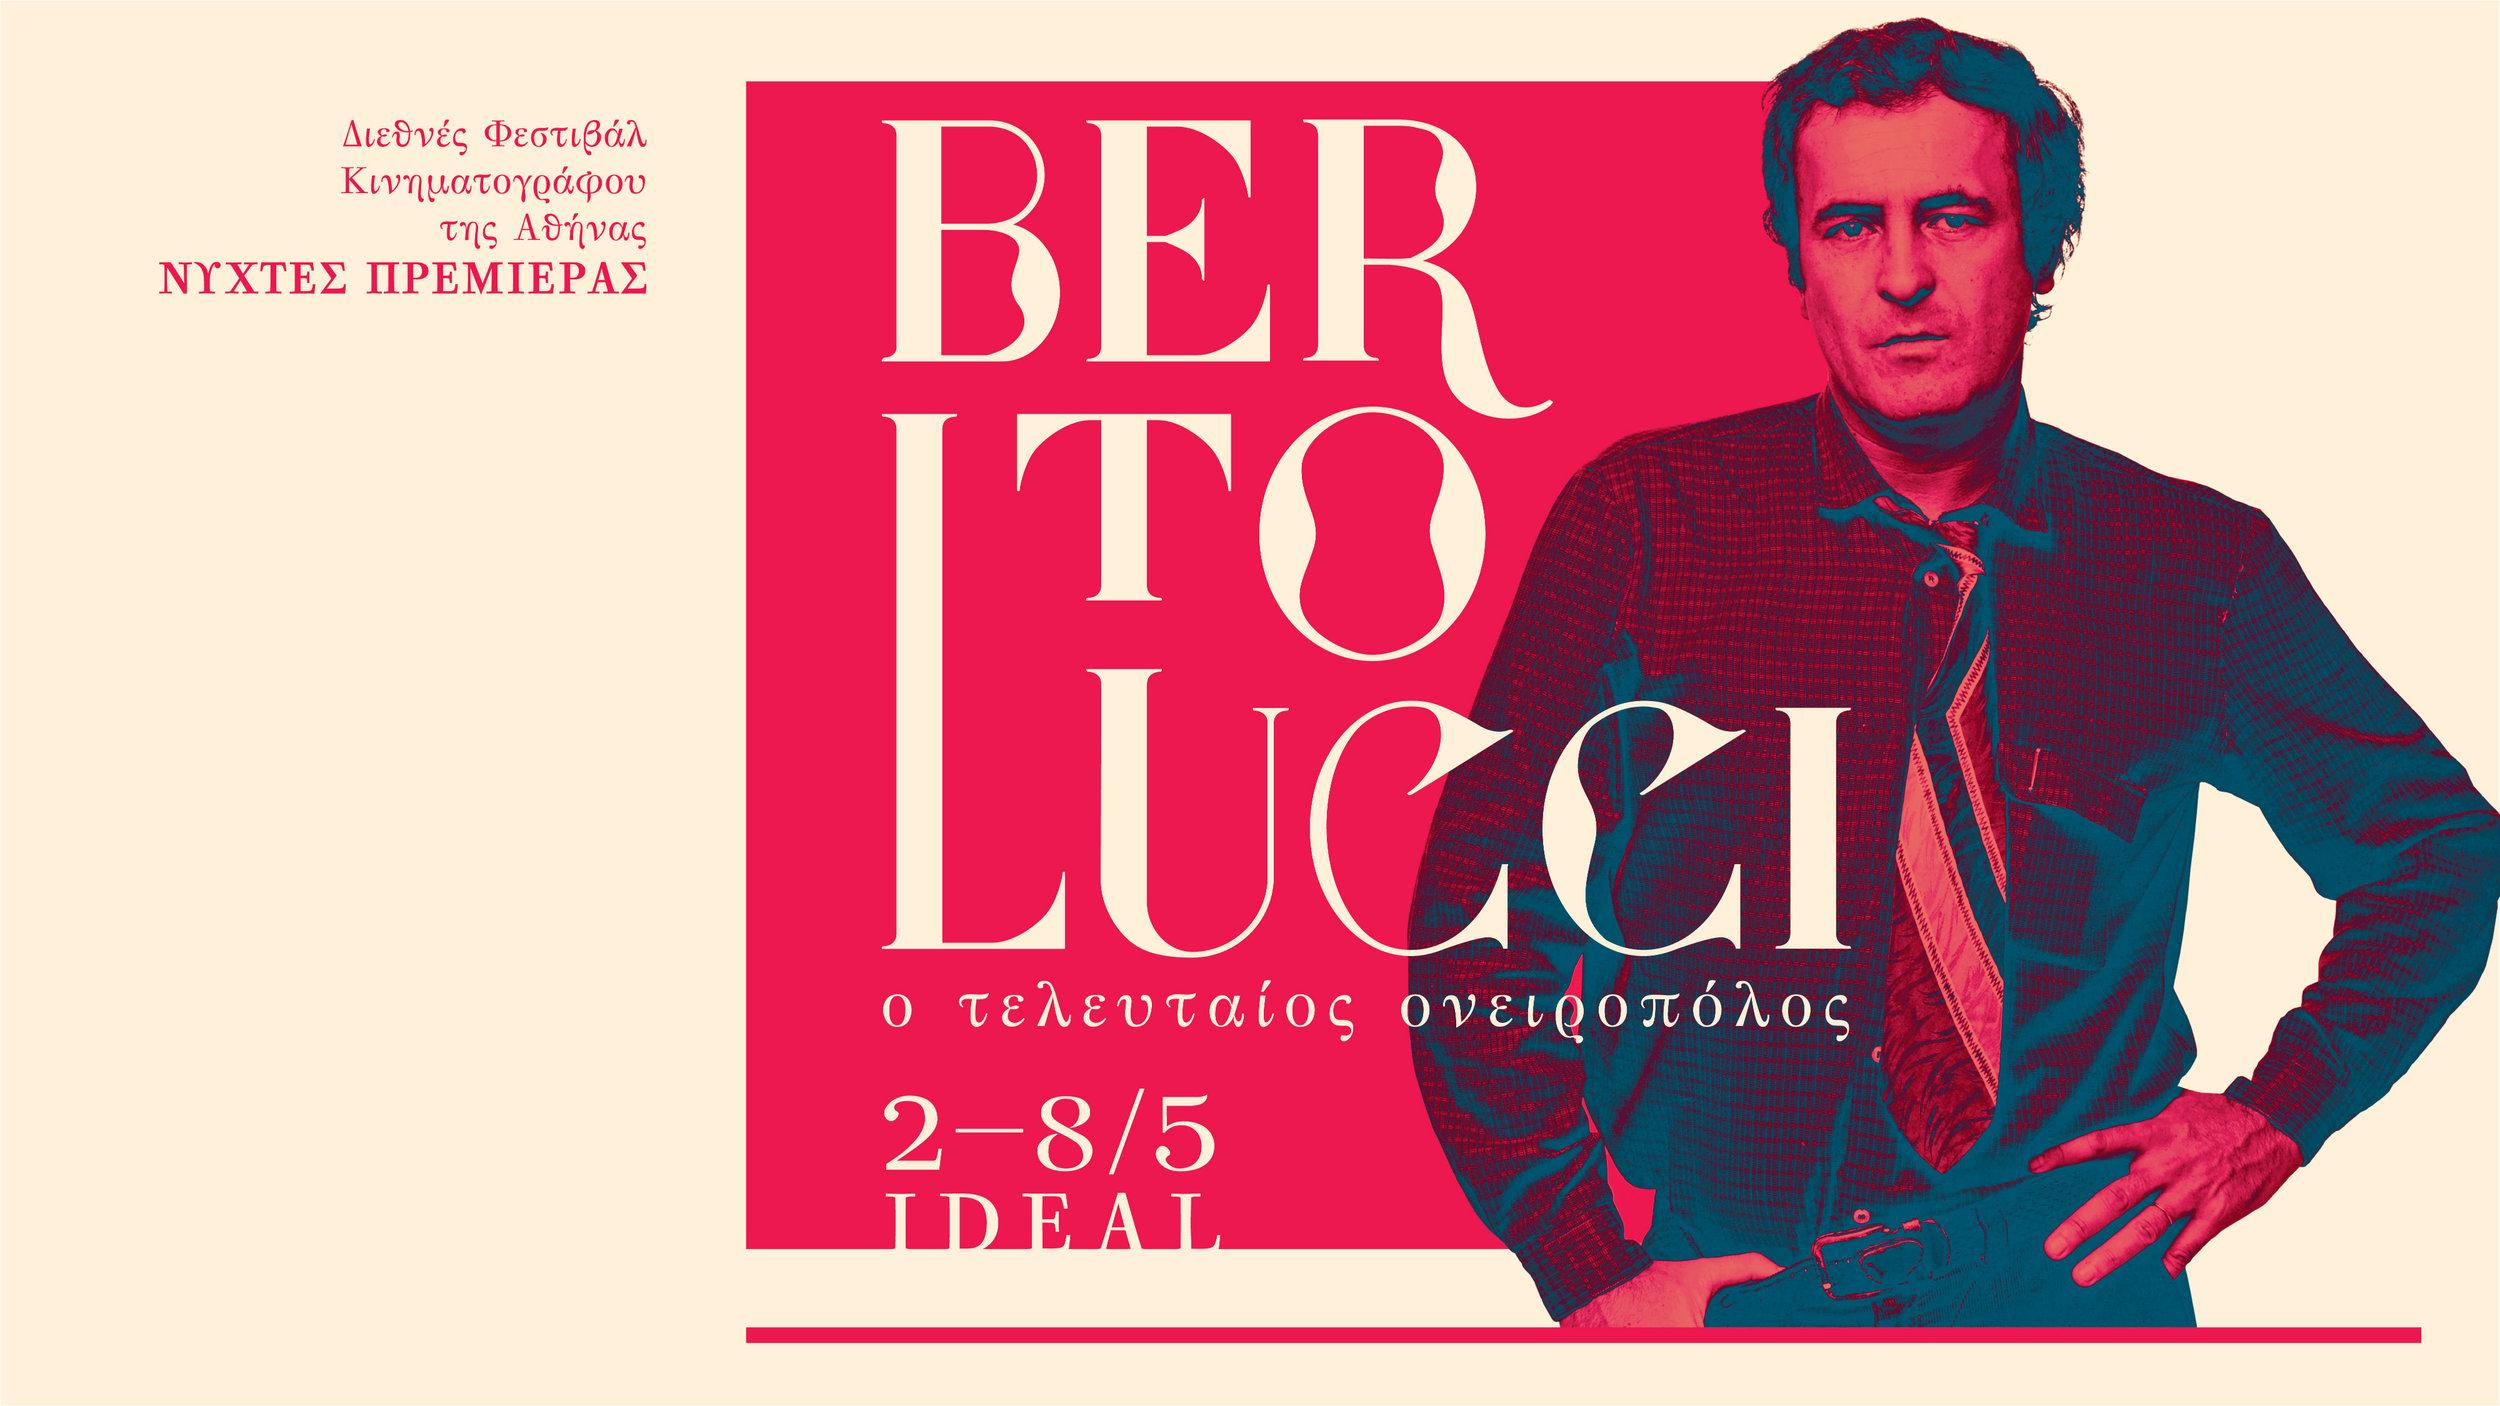 bertolucci-cover_1581_107717380.JPG